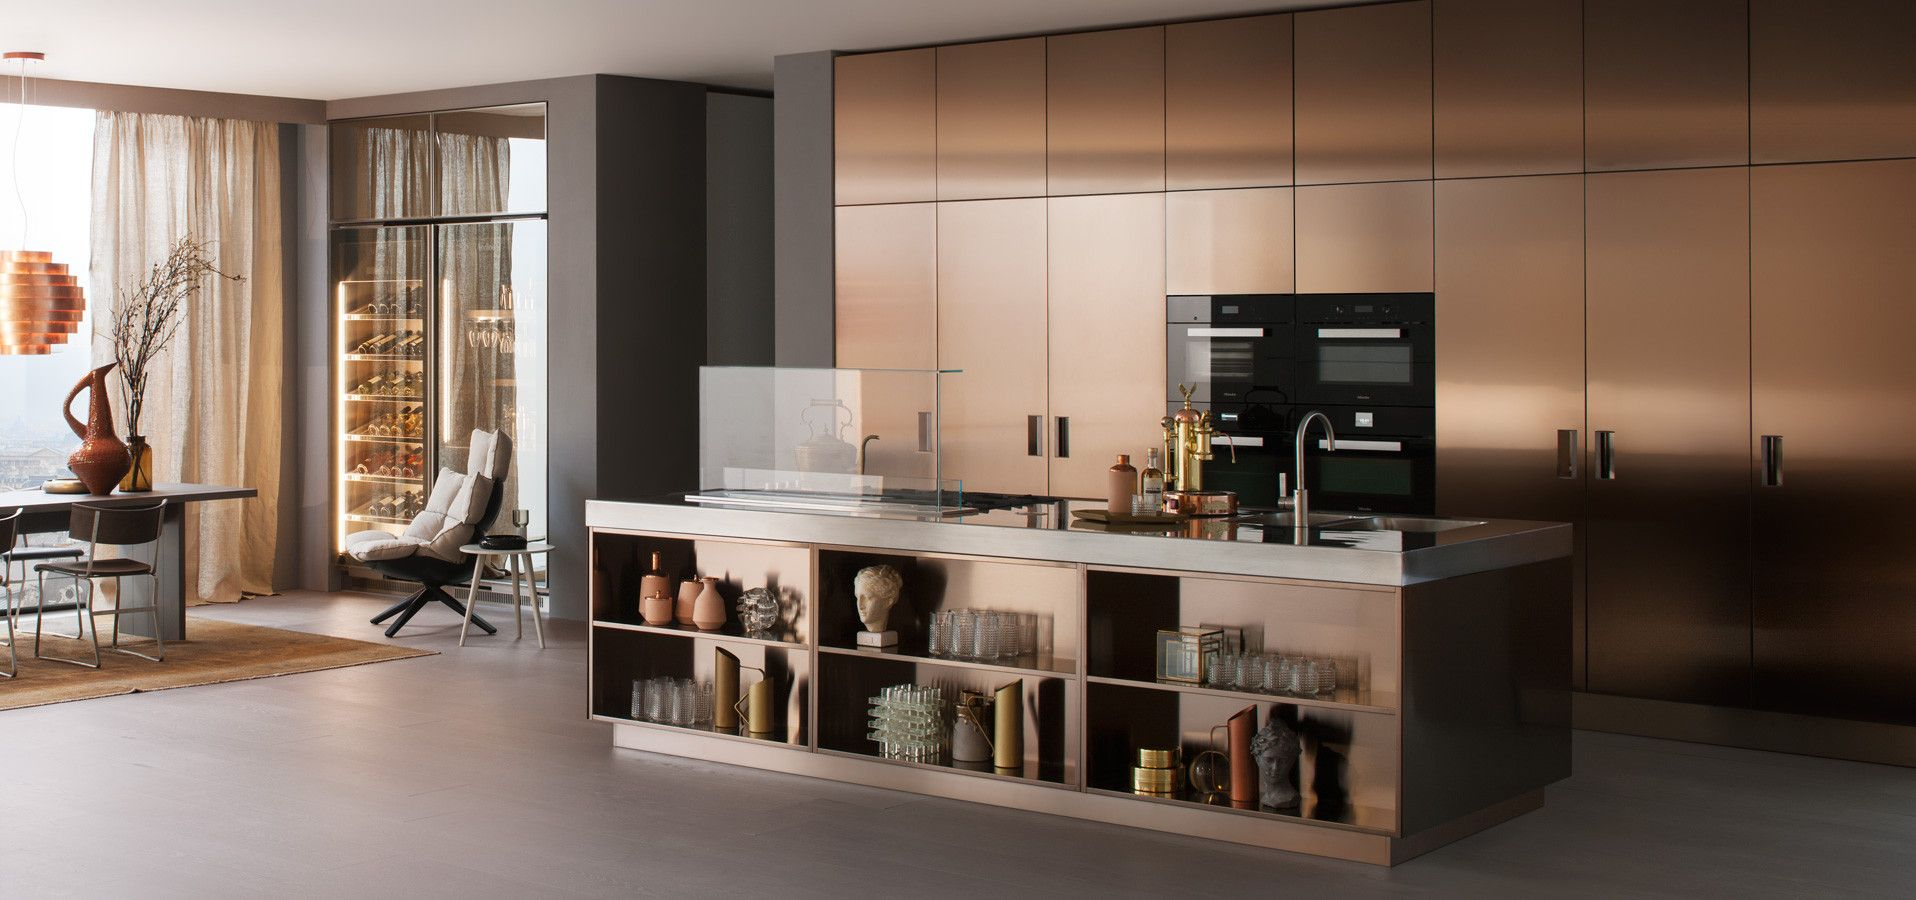 Arclinea I Küche Italia